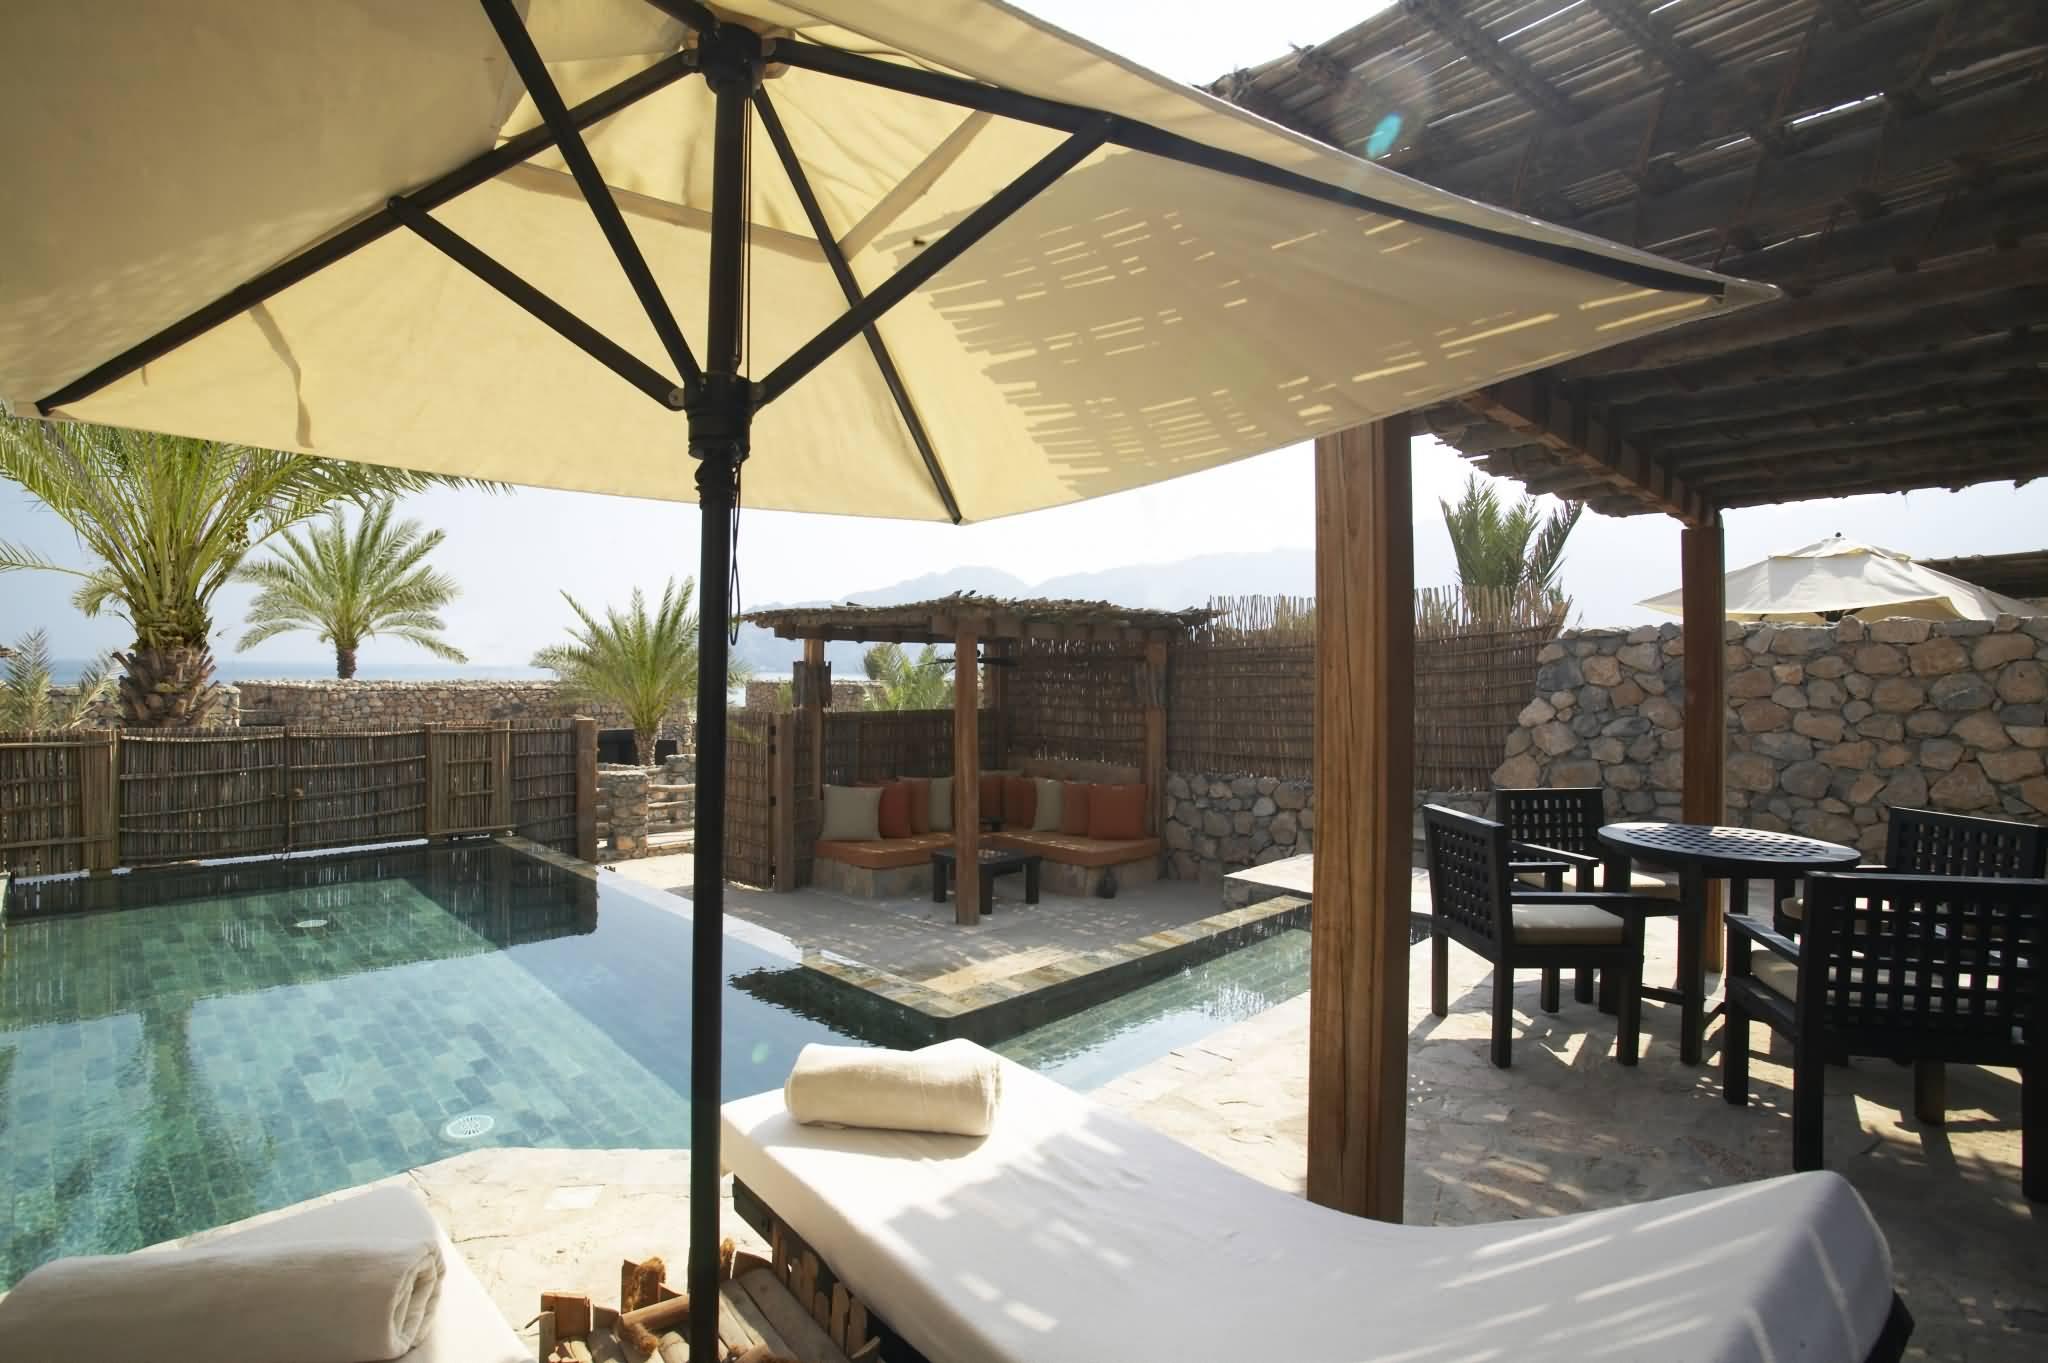 SSZB Pool Villa Deck